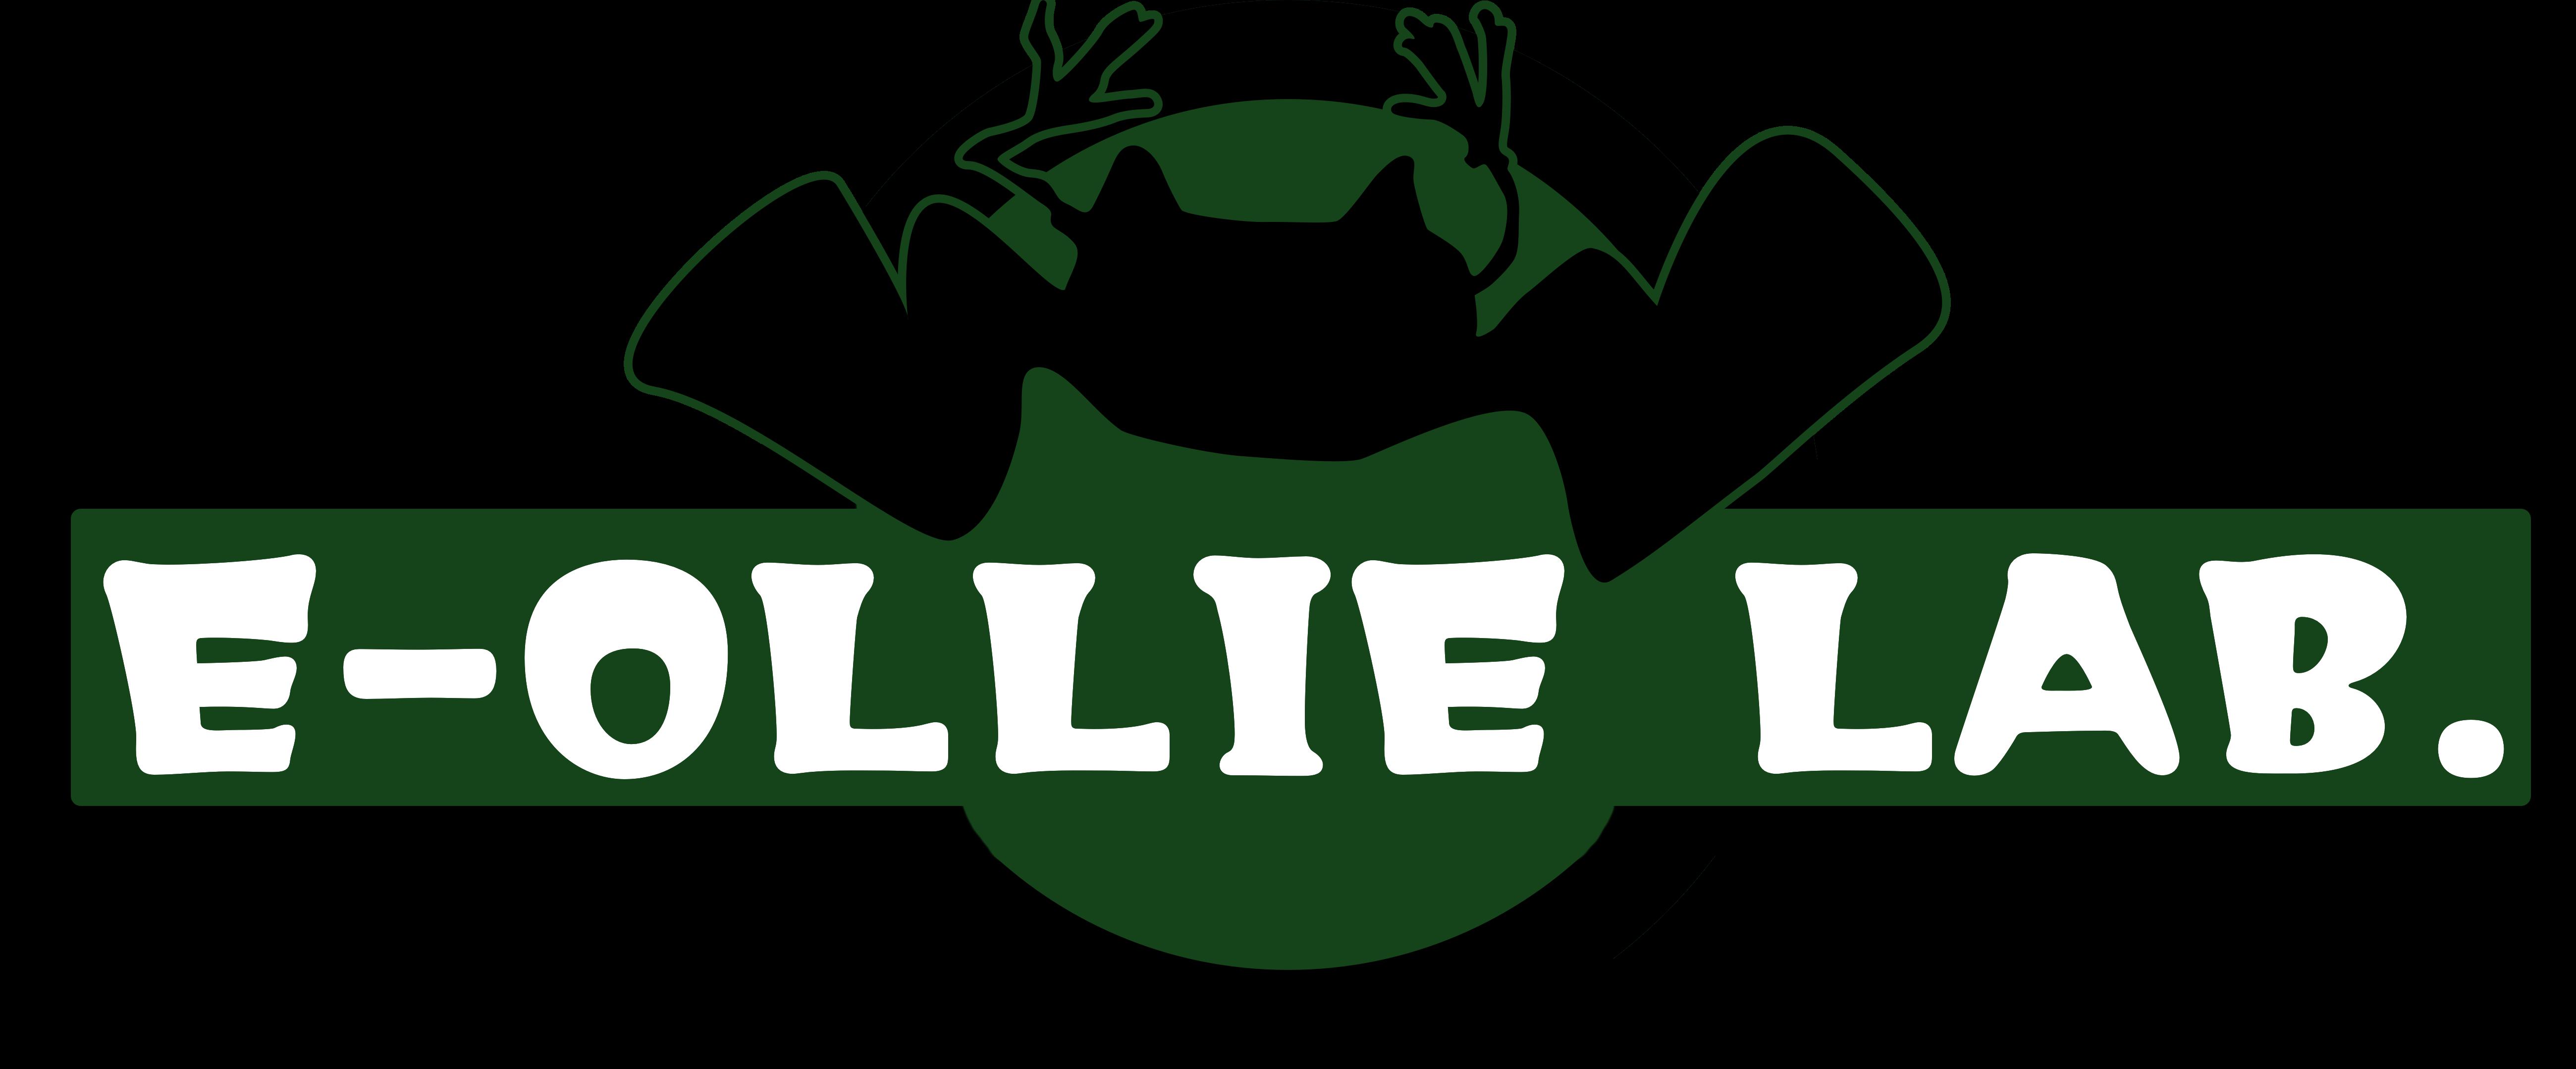 E-OLLIE LAB.